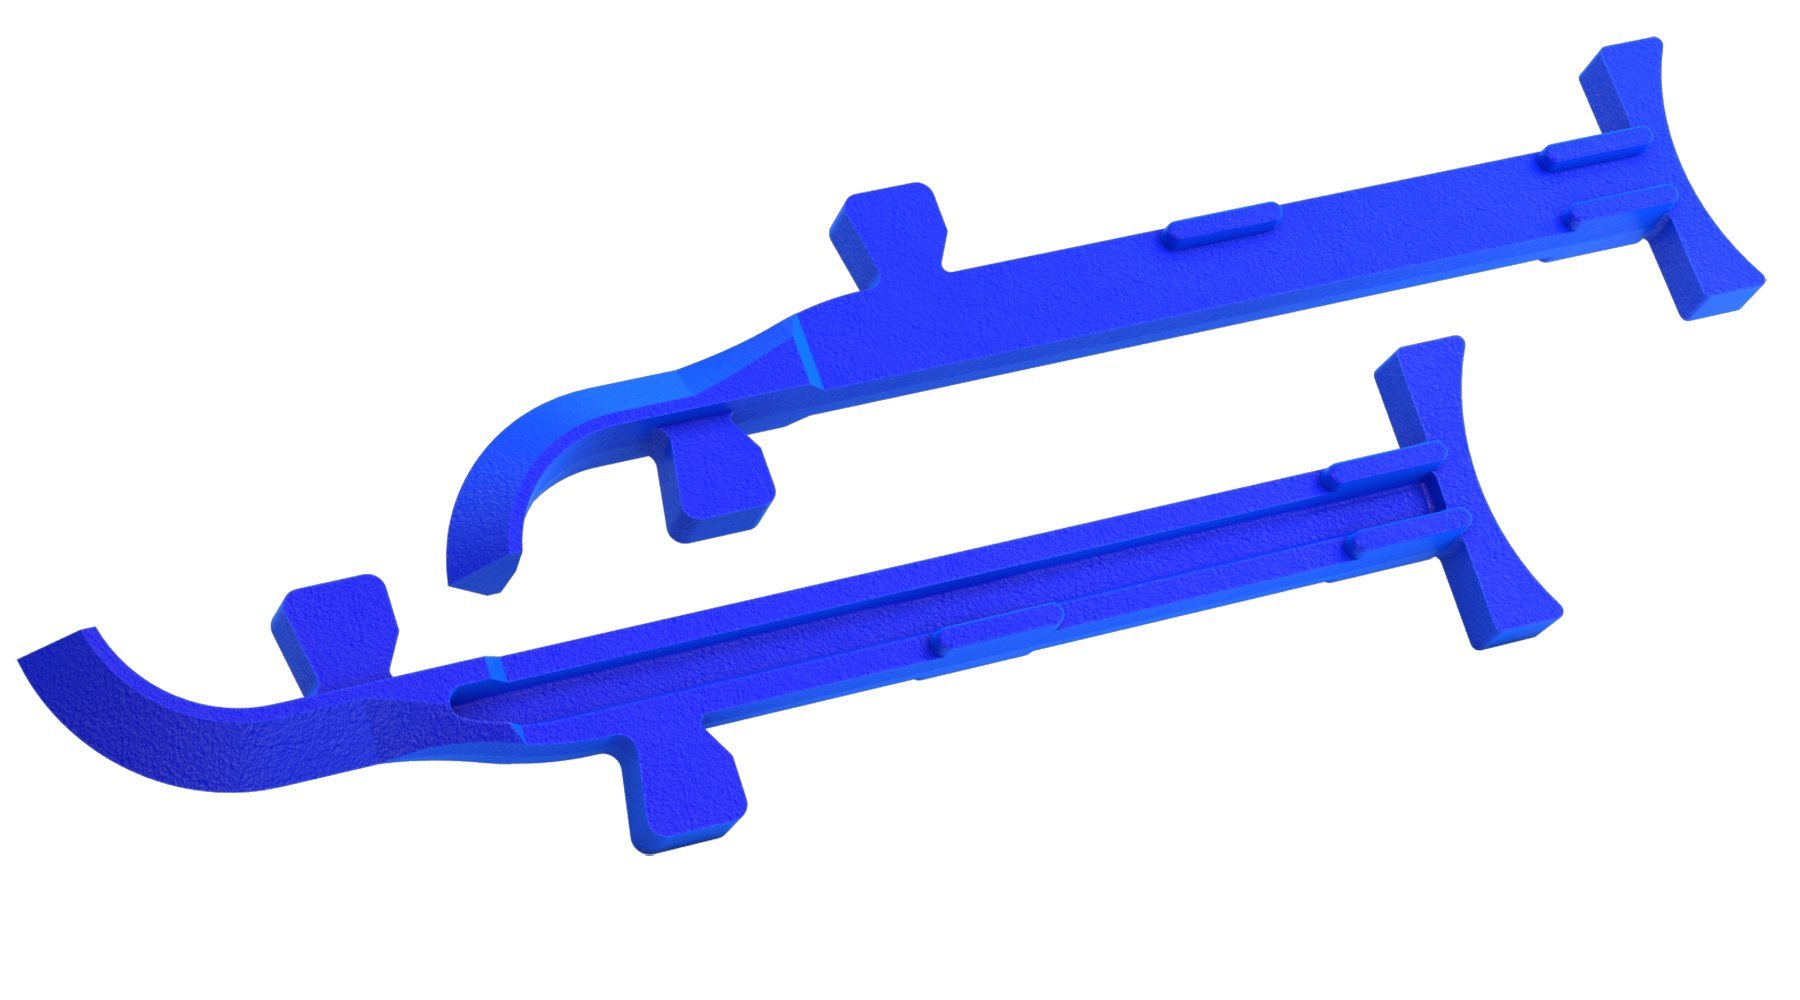 Bon 11-292 6-Inch to 8-Inch Cast Aluminum Line Stretchers, 1-Pair by BON (Image #1)